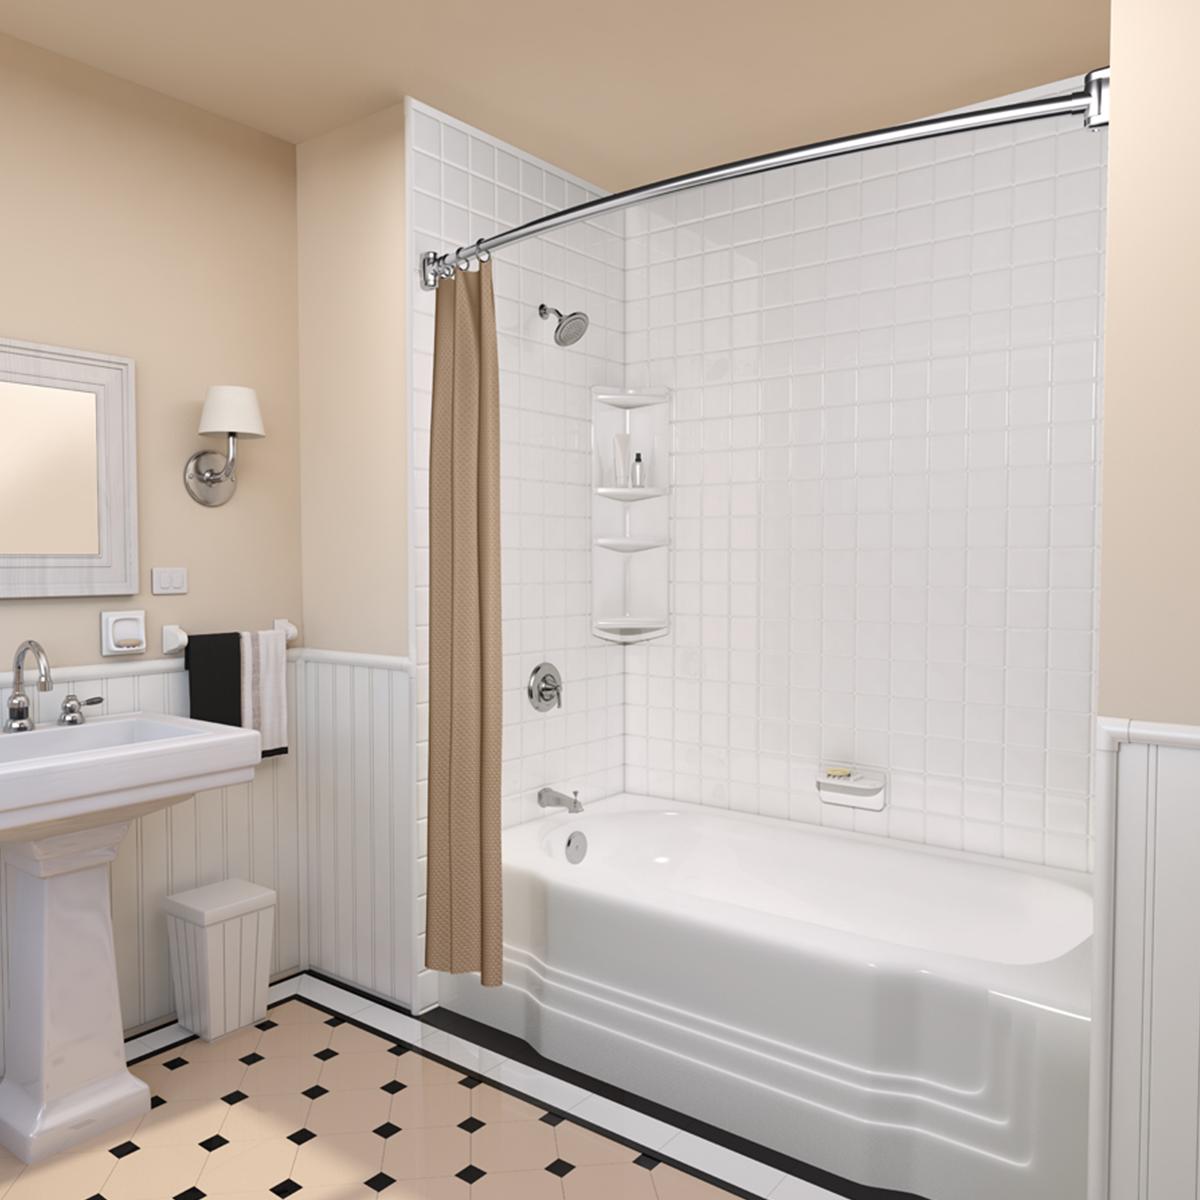 A Bath Fitter Remodel Makes Your Entire Bathroom Feel New Bath